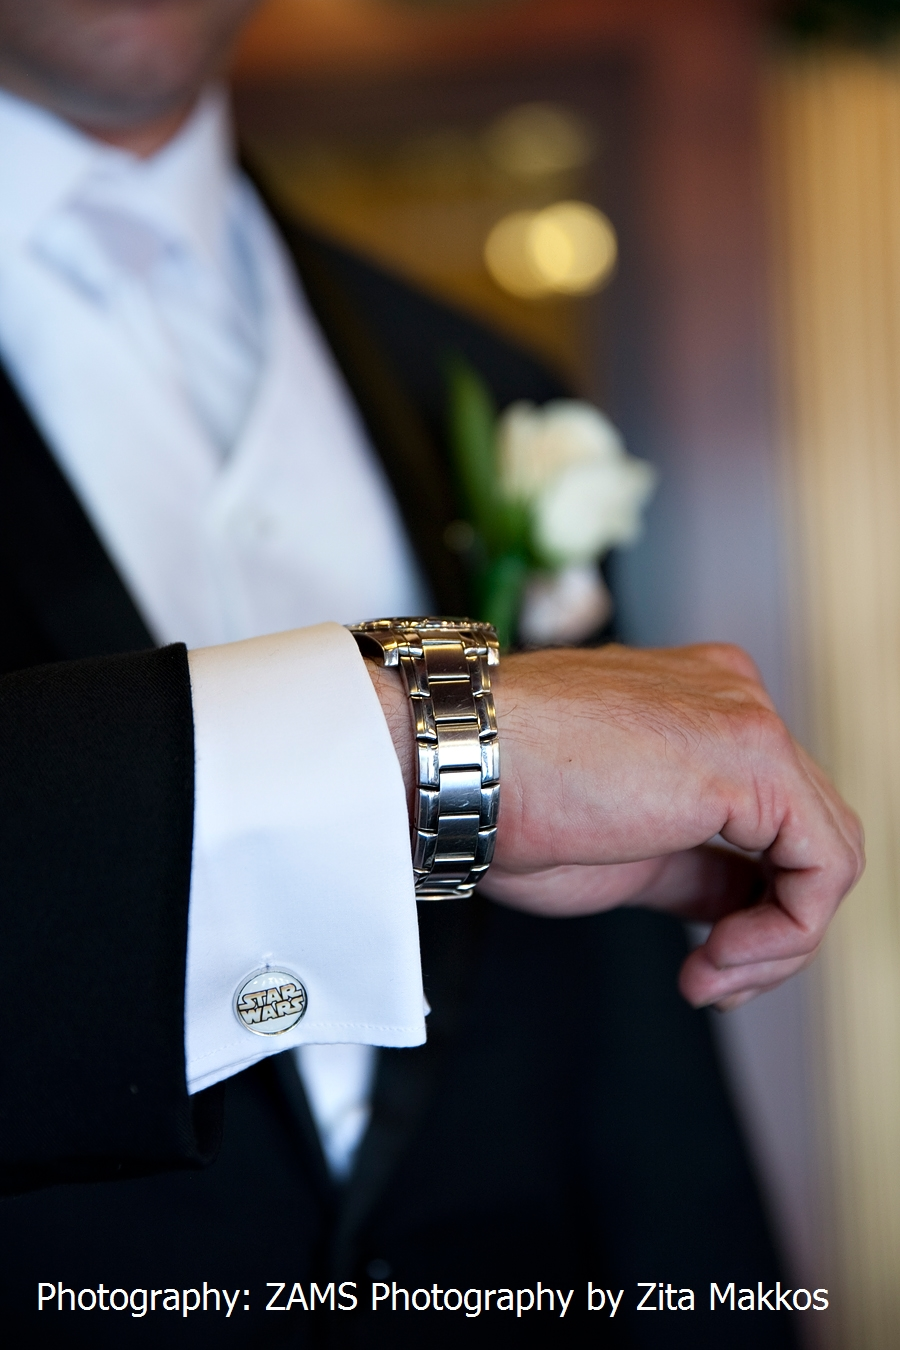 japan_flags_world_collection_cuff_links_men_weddings_groomsmen_grooms_dads_gifts_cufflinks_2.jpg